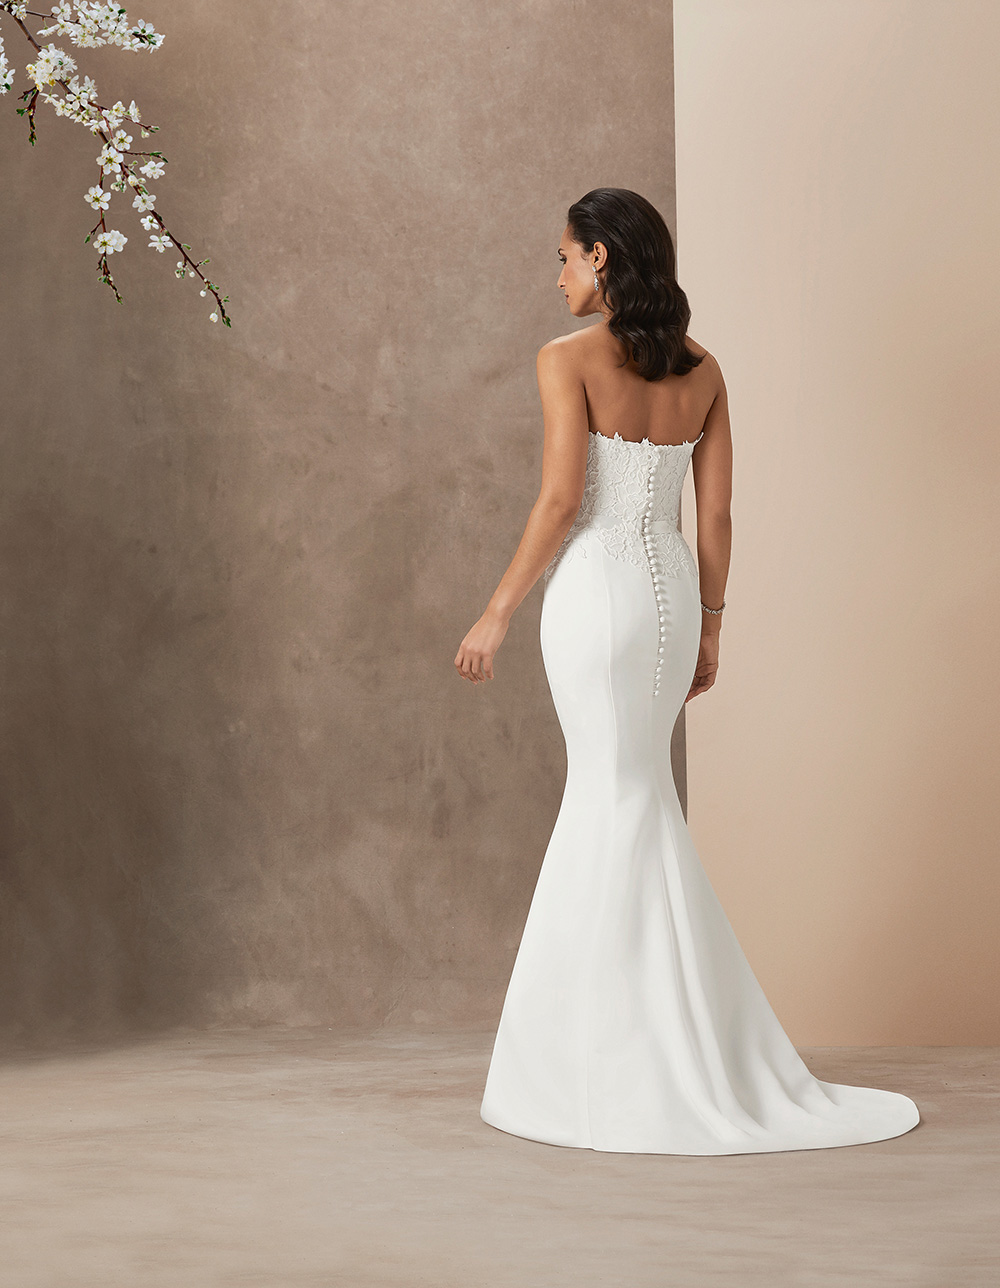 Cara luxury wedding gowns by Caroline Castigliano